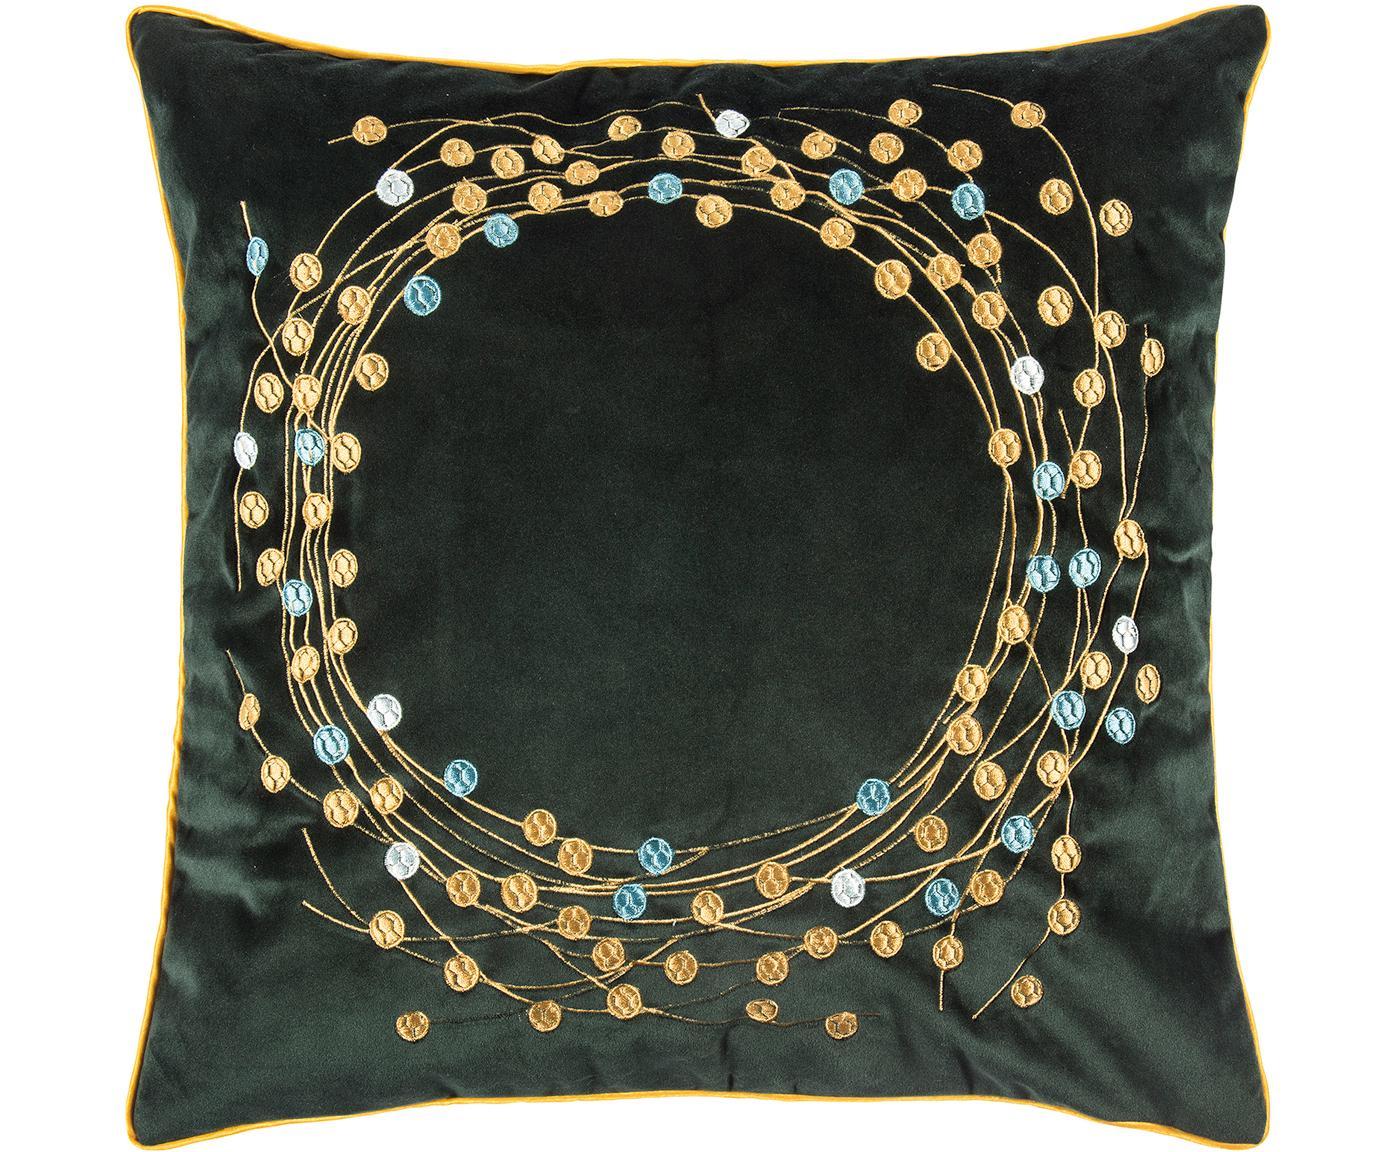 Fluwelen kussenhoes Circle, Polyester fluweel, Donkergroen, goudkleurig, 45 x 45 cm